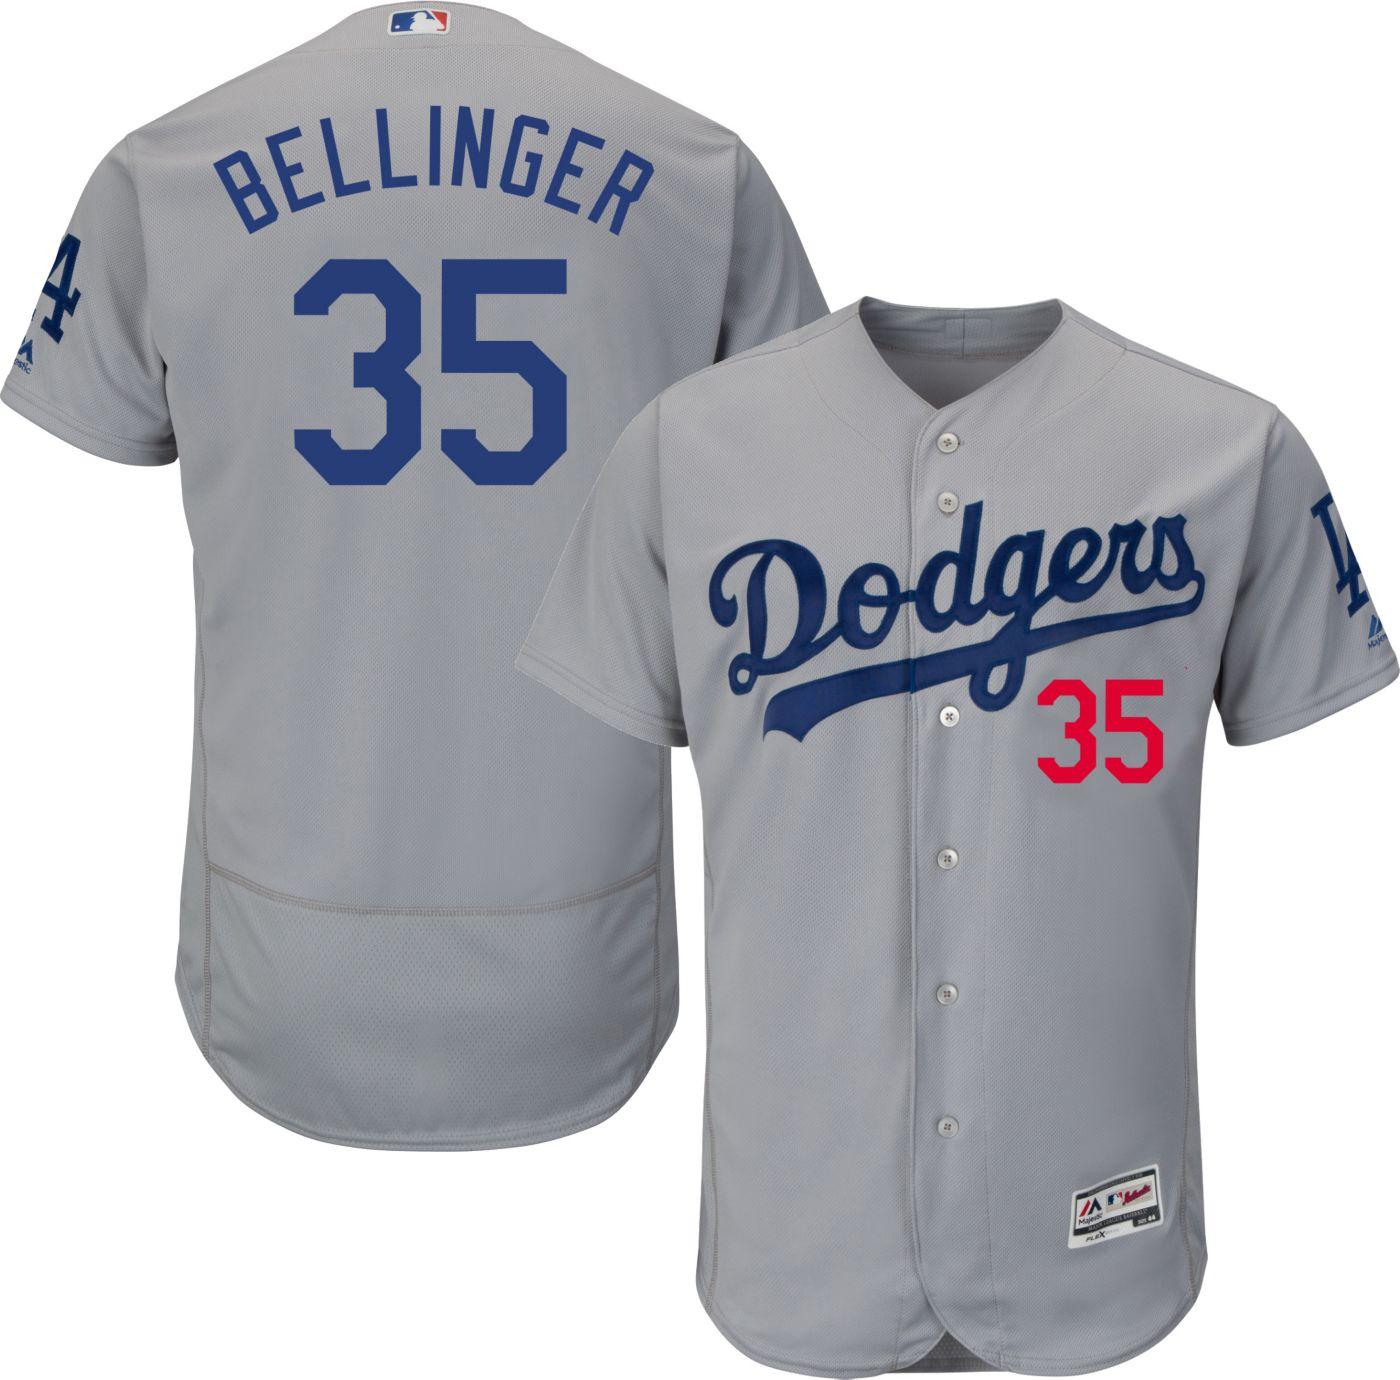 Majestic Men's Authentic Los Angeles Dodgers Cody Bellinger #35 Flex Base Alternate Road Grey On-Field Jersey